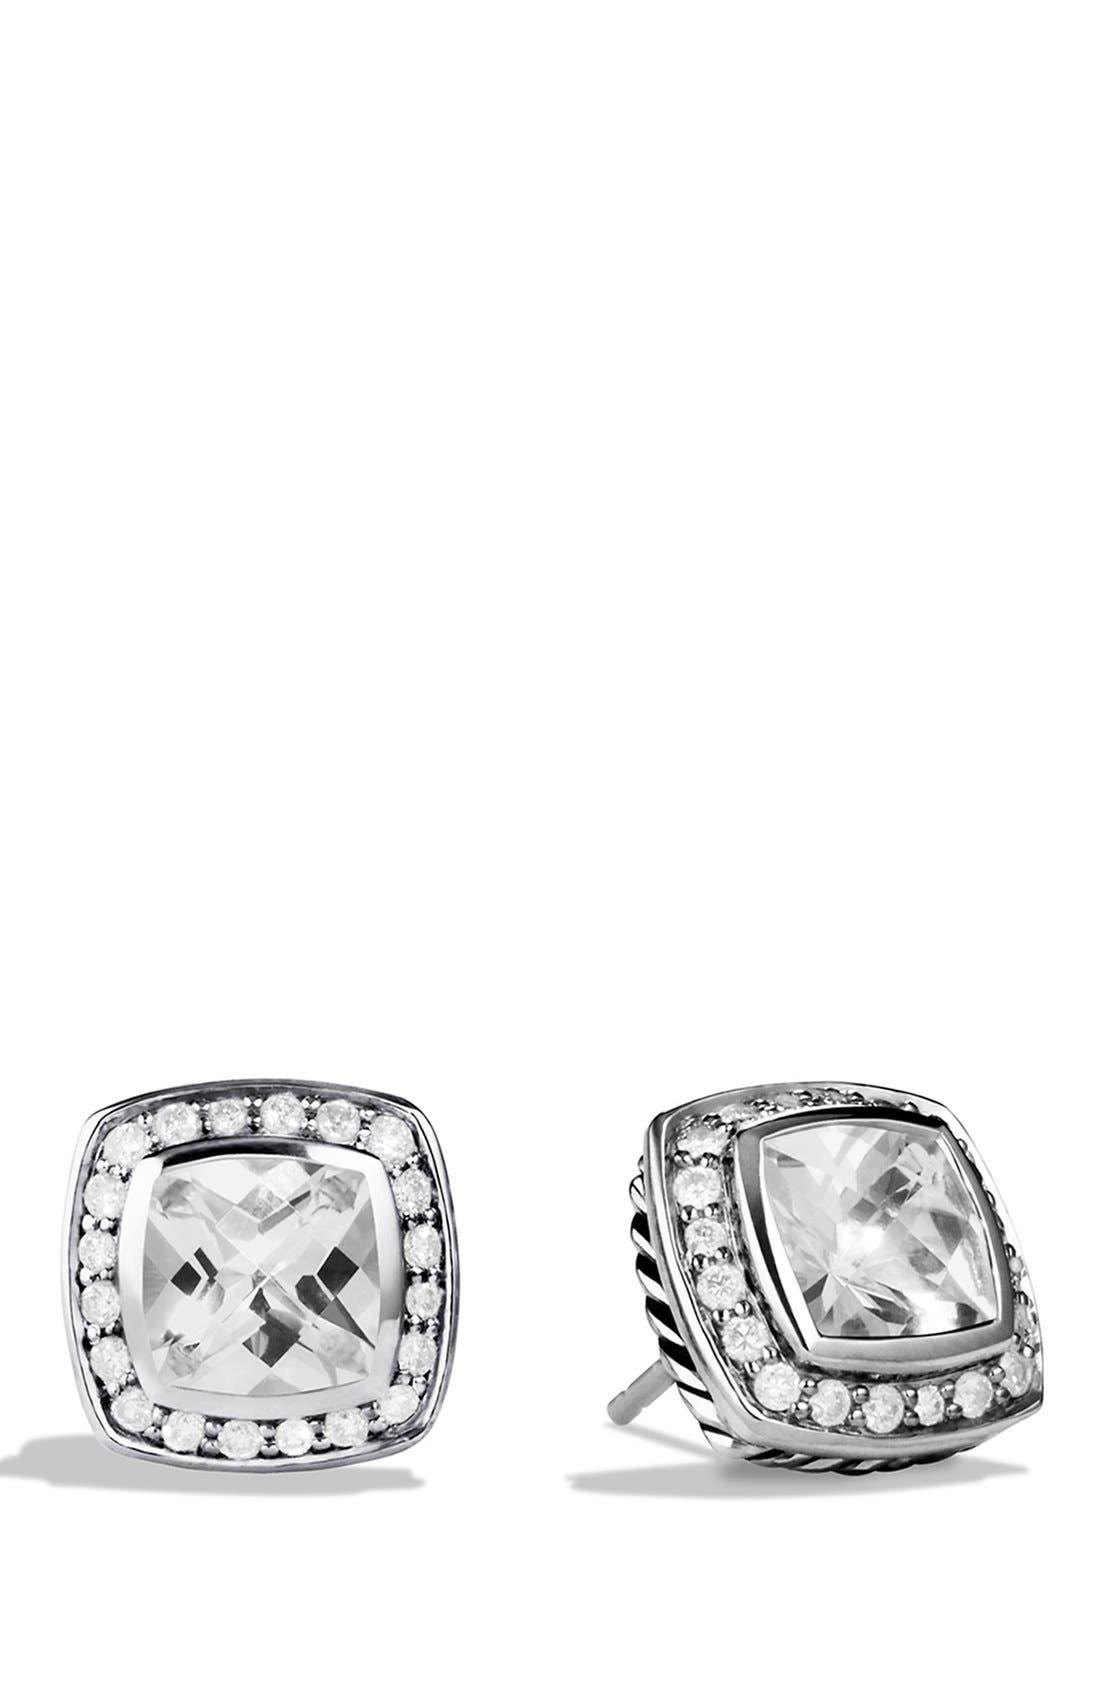 'Albion' Petite Earrings with Semiprecious Stones & Diamonds,                             Main thumbnail 3, color,